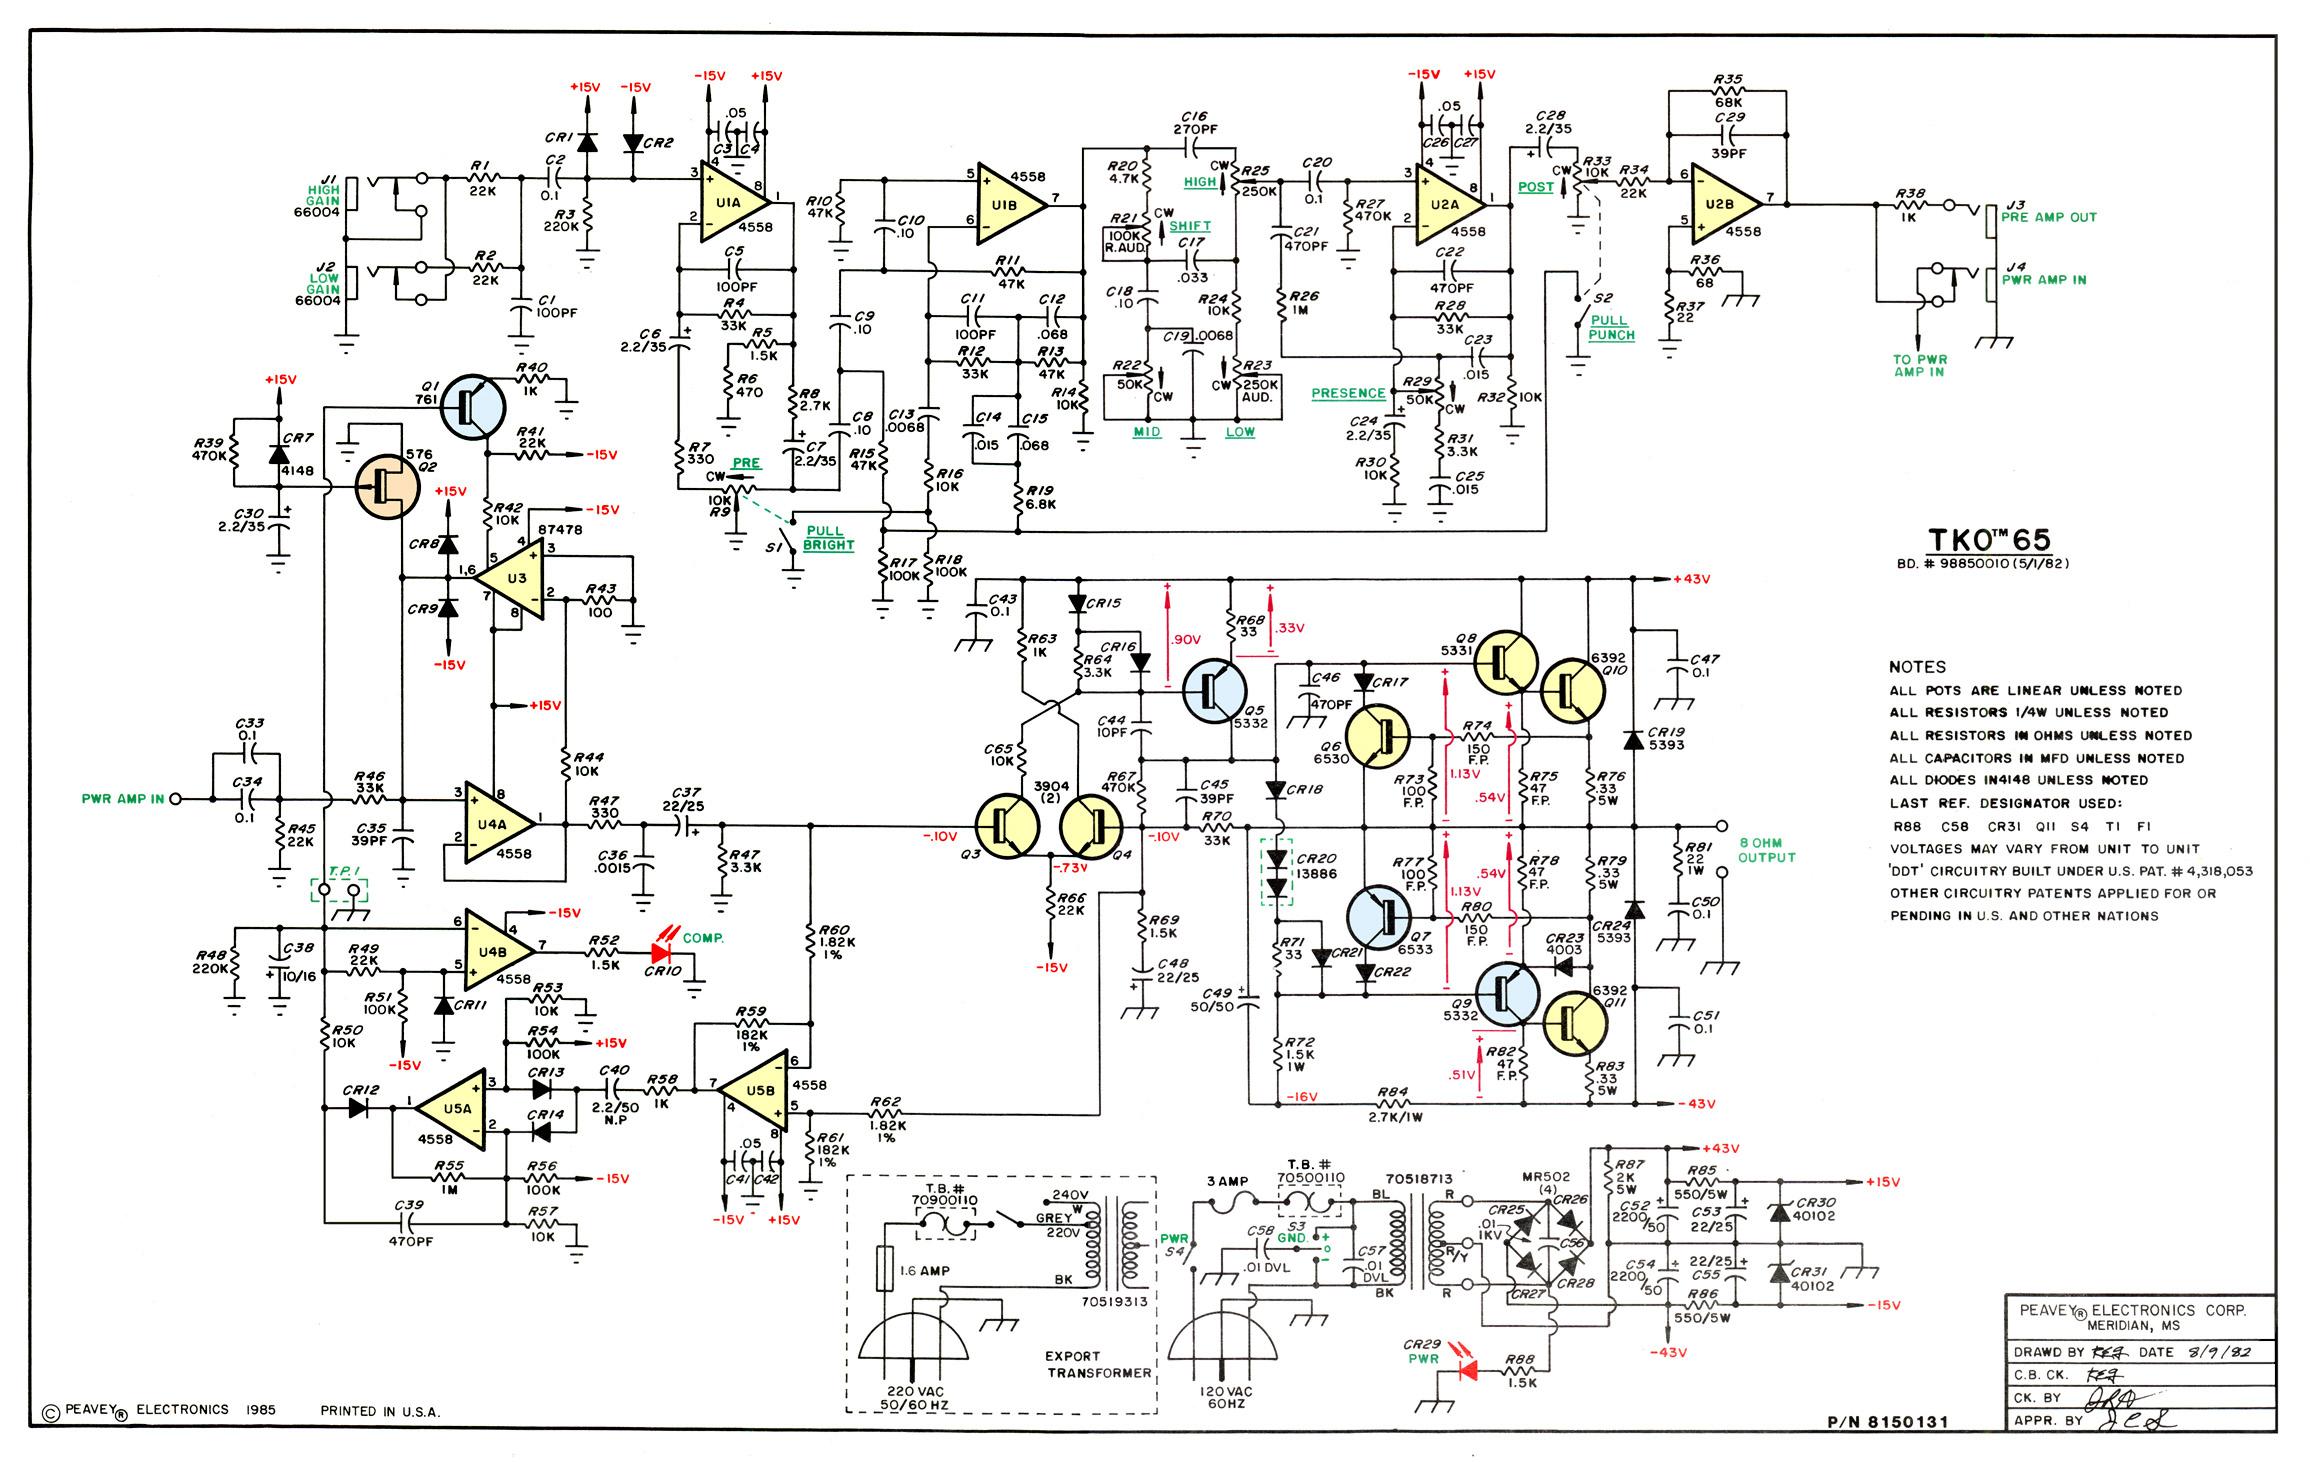 Exelent Peavey Rockmaster Schematic Ensign - Wiring Diagram Ideas ...